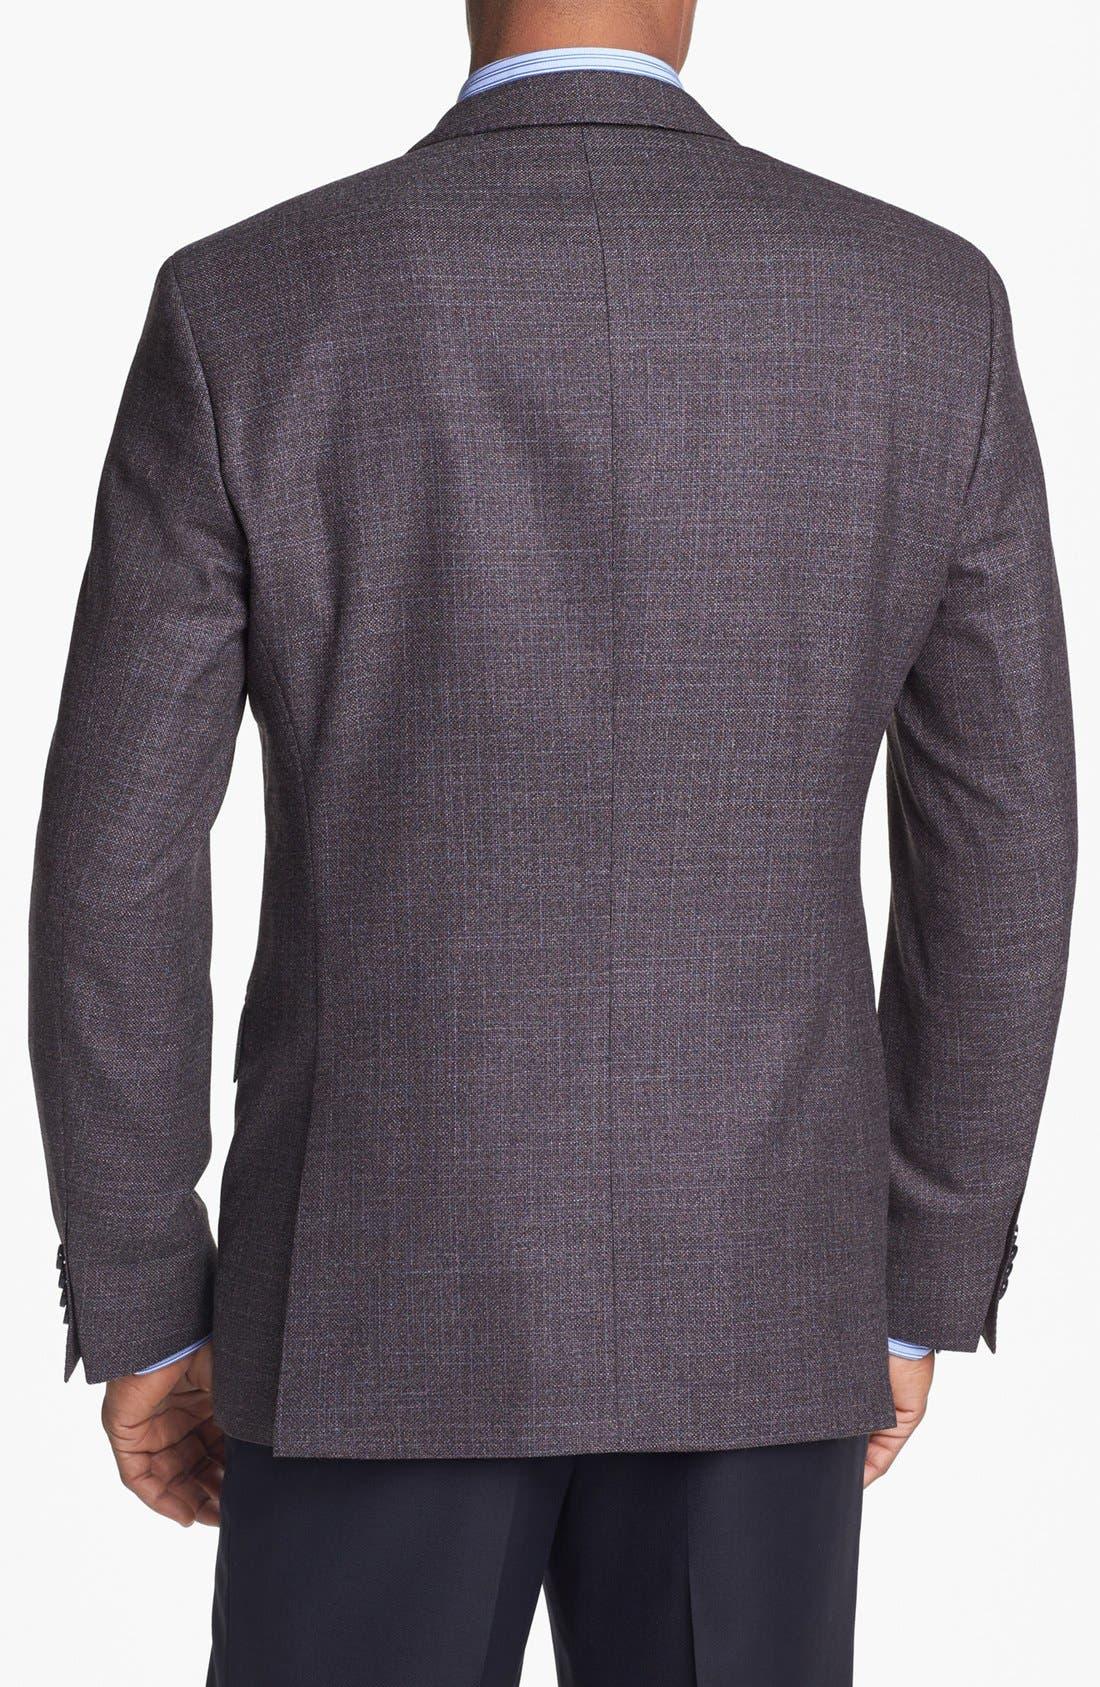 Alternate Image 3  - BOSS HUGO BOSS 'The Keys' Trim Fit Wool Sportcoat